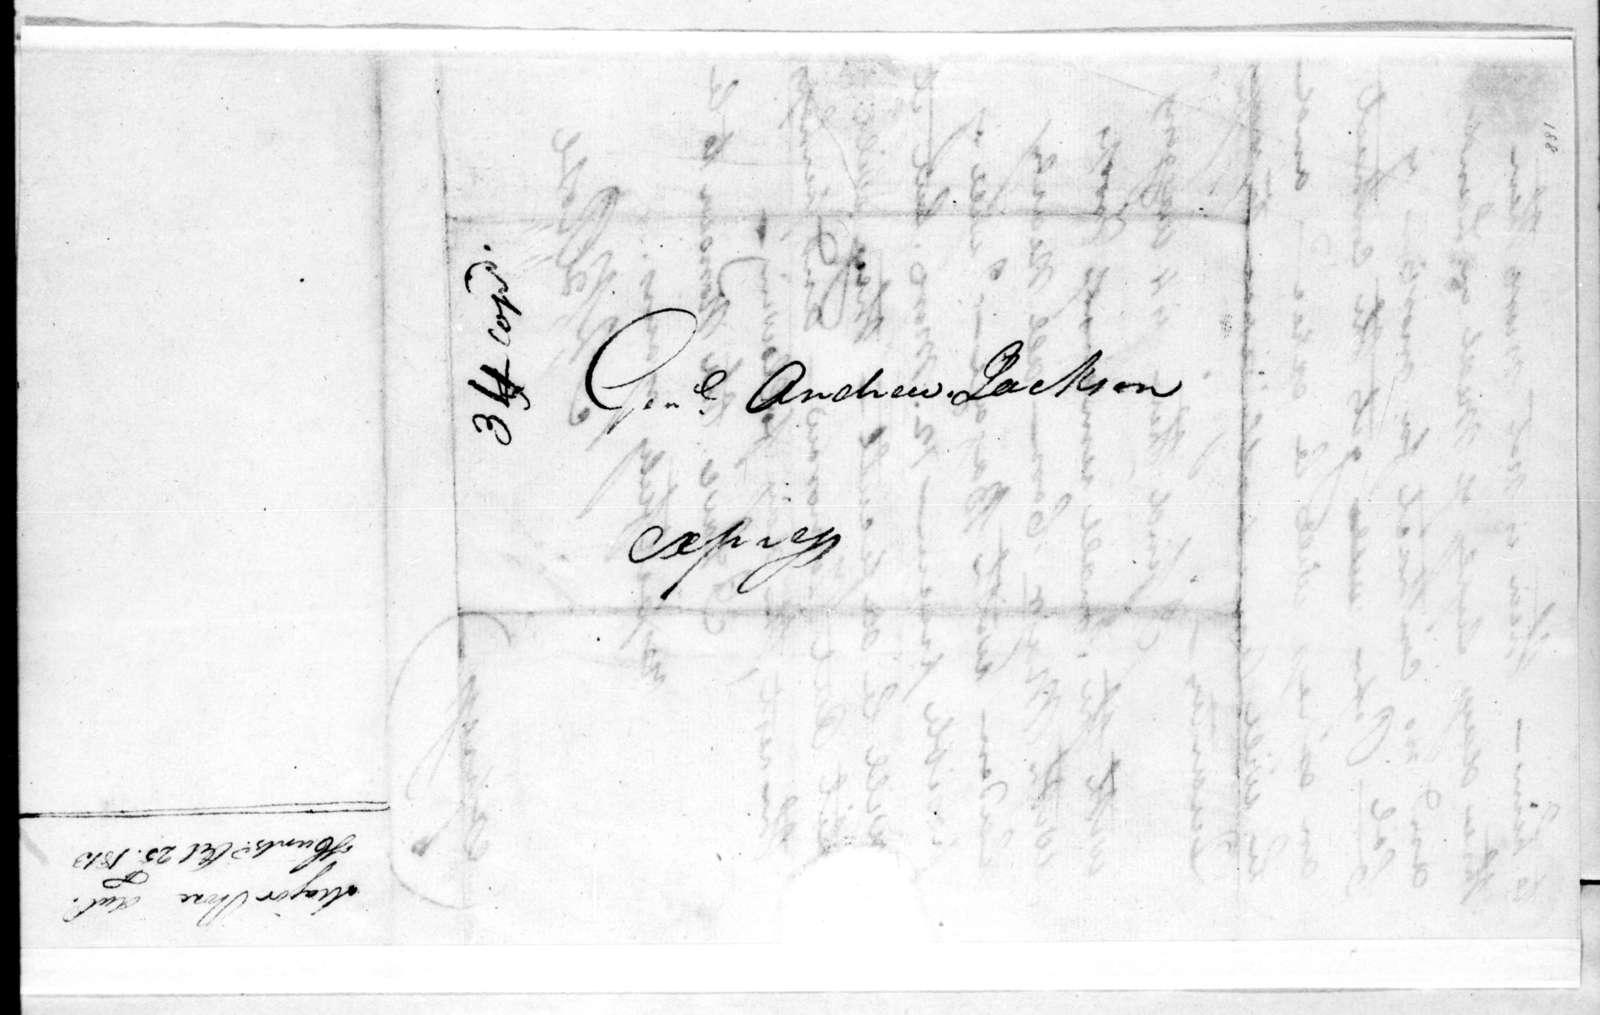 Neil B. Rose to Andrew Jackson, October 25, 1813